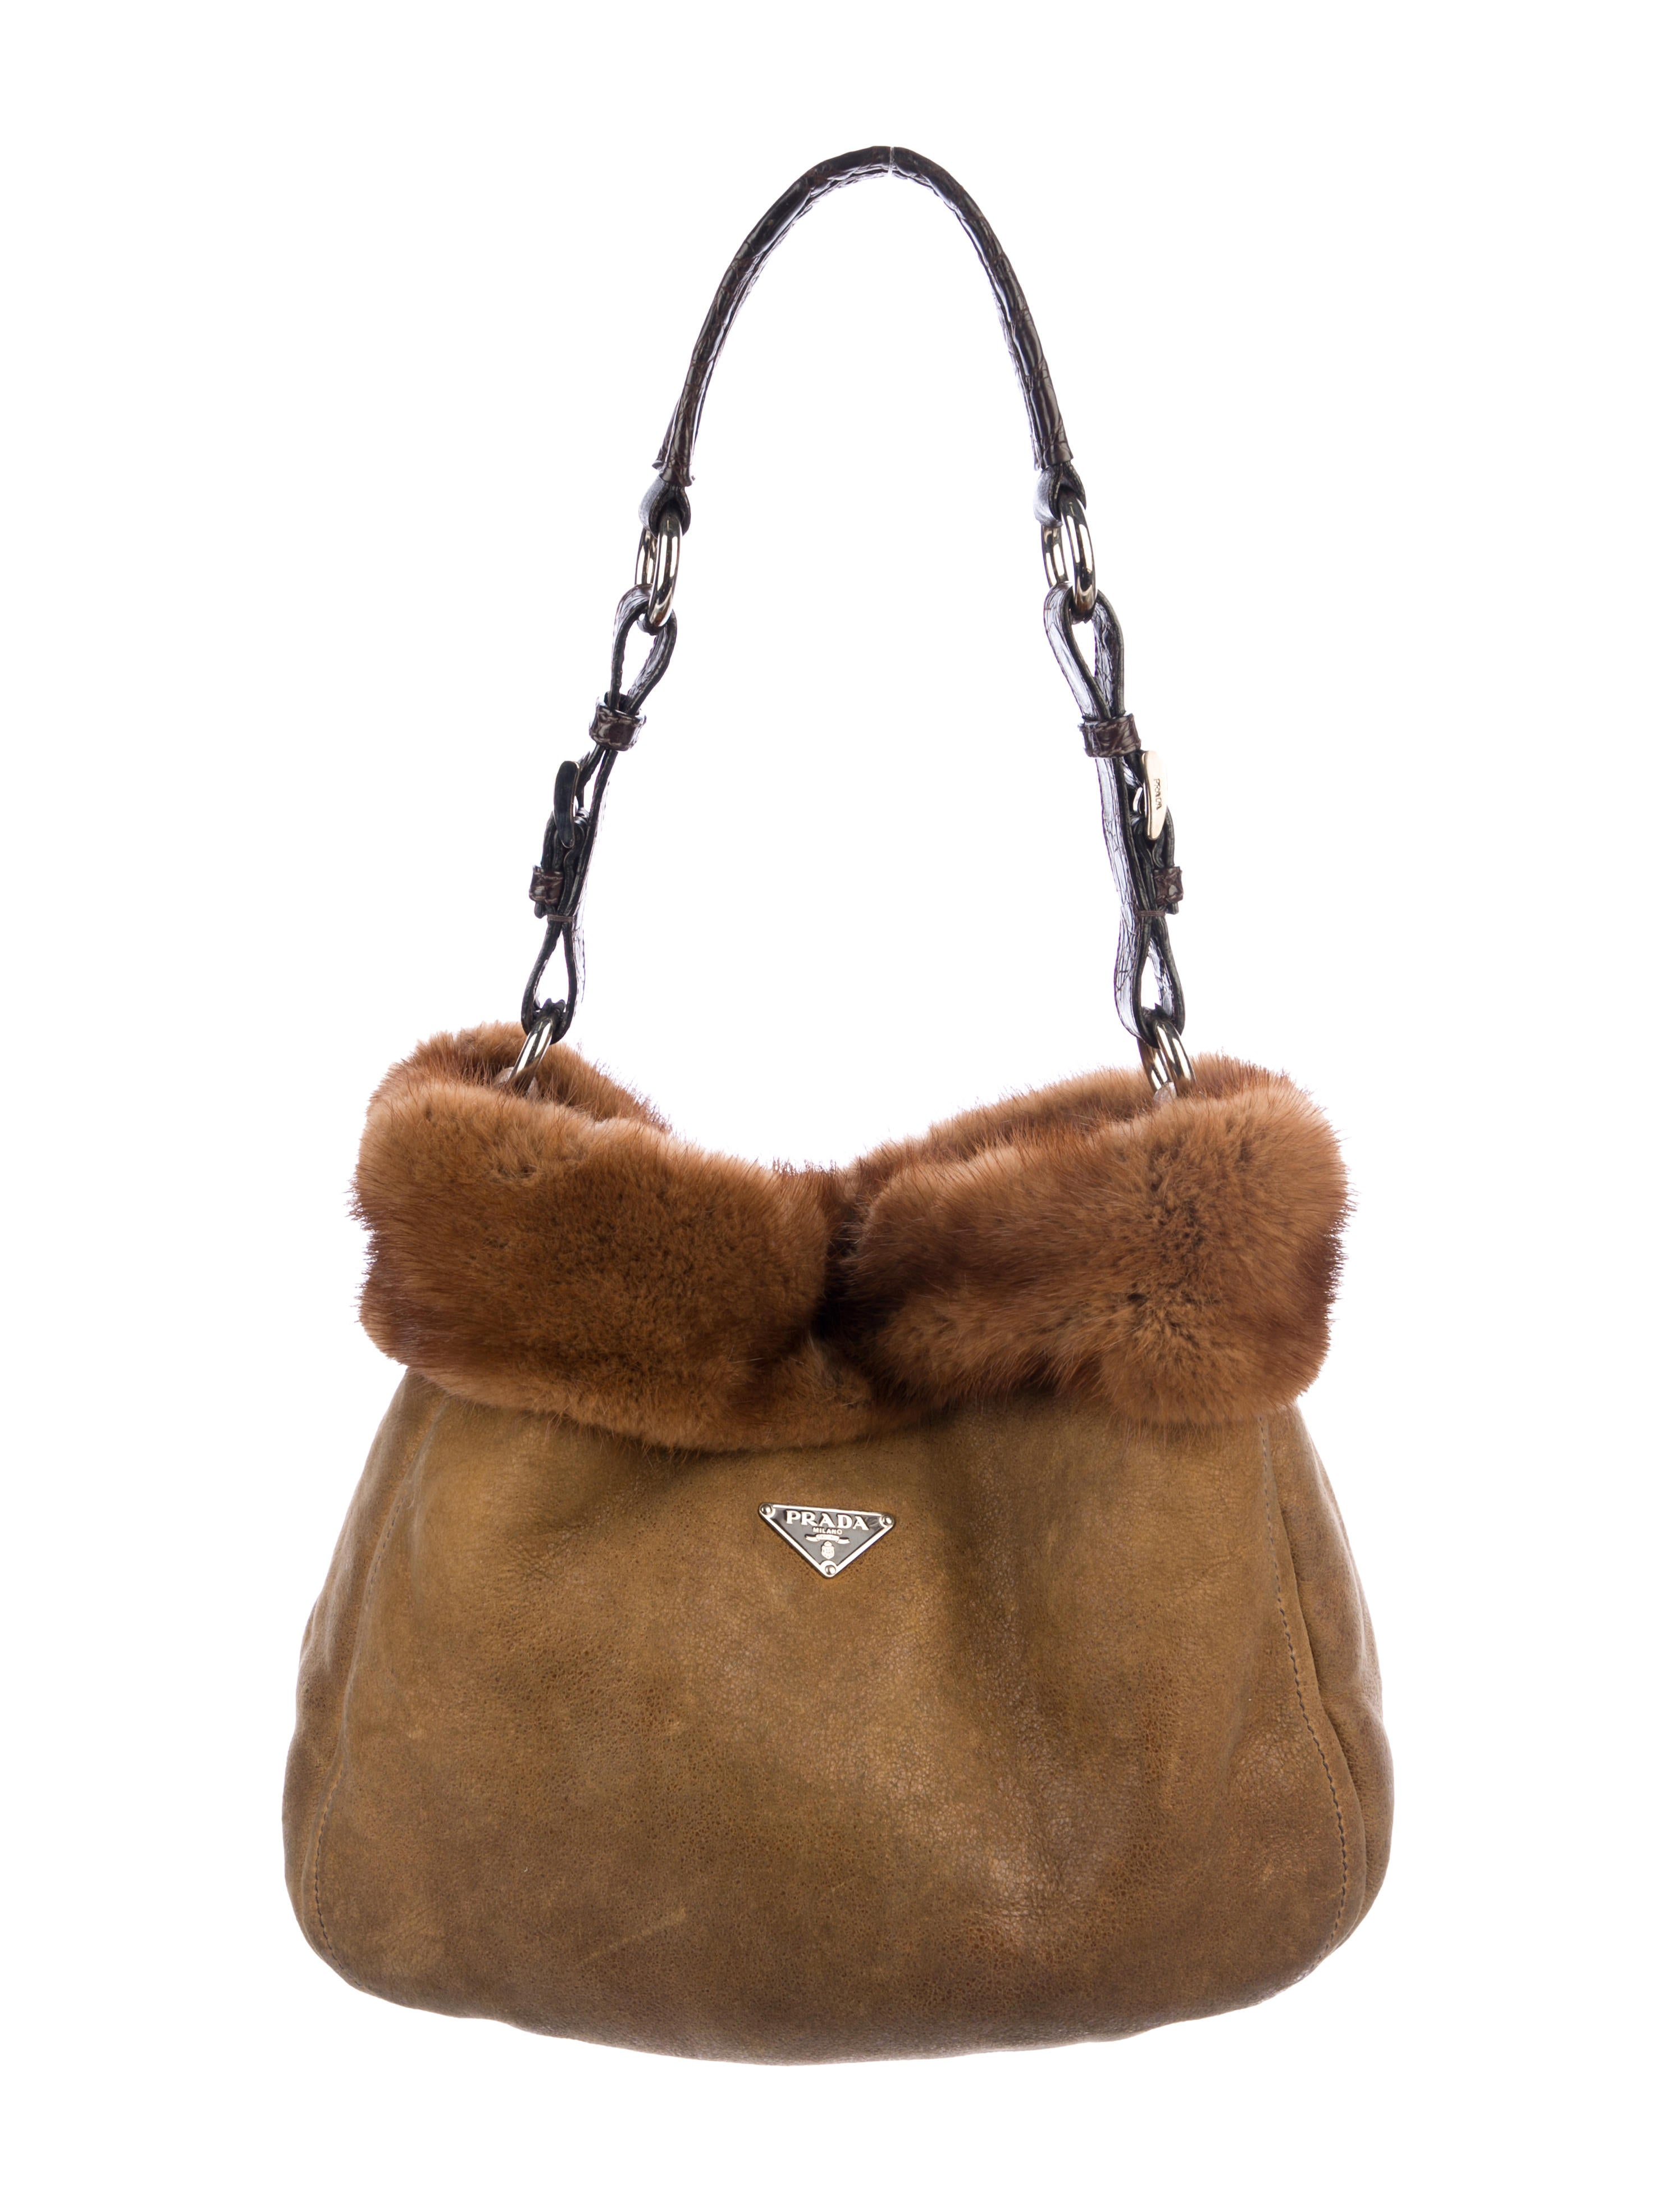 8c5a9c0e46e4 Prada Mink & Crocodile Hobo - Handbags - PRA229038   The RealReal